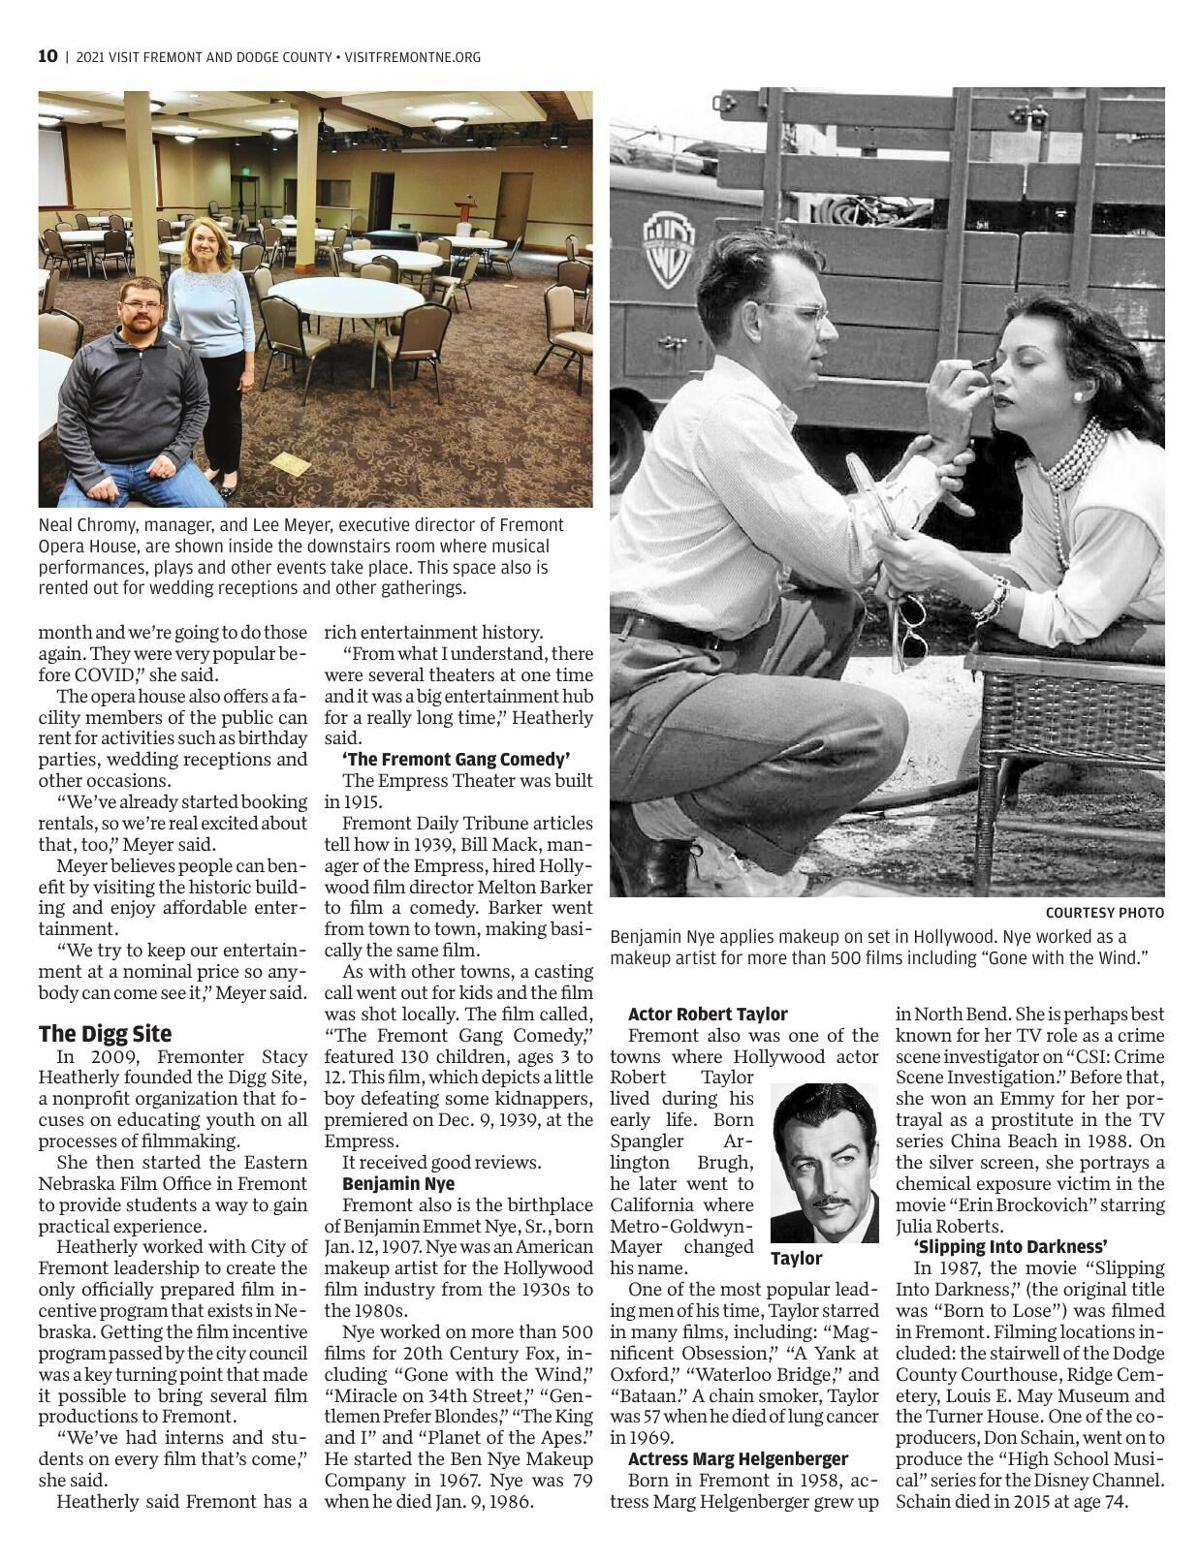 Visit Fremont and Dodge County 2021 10.pdf